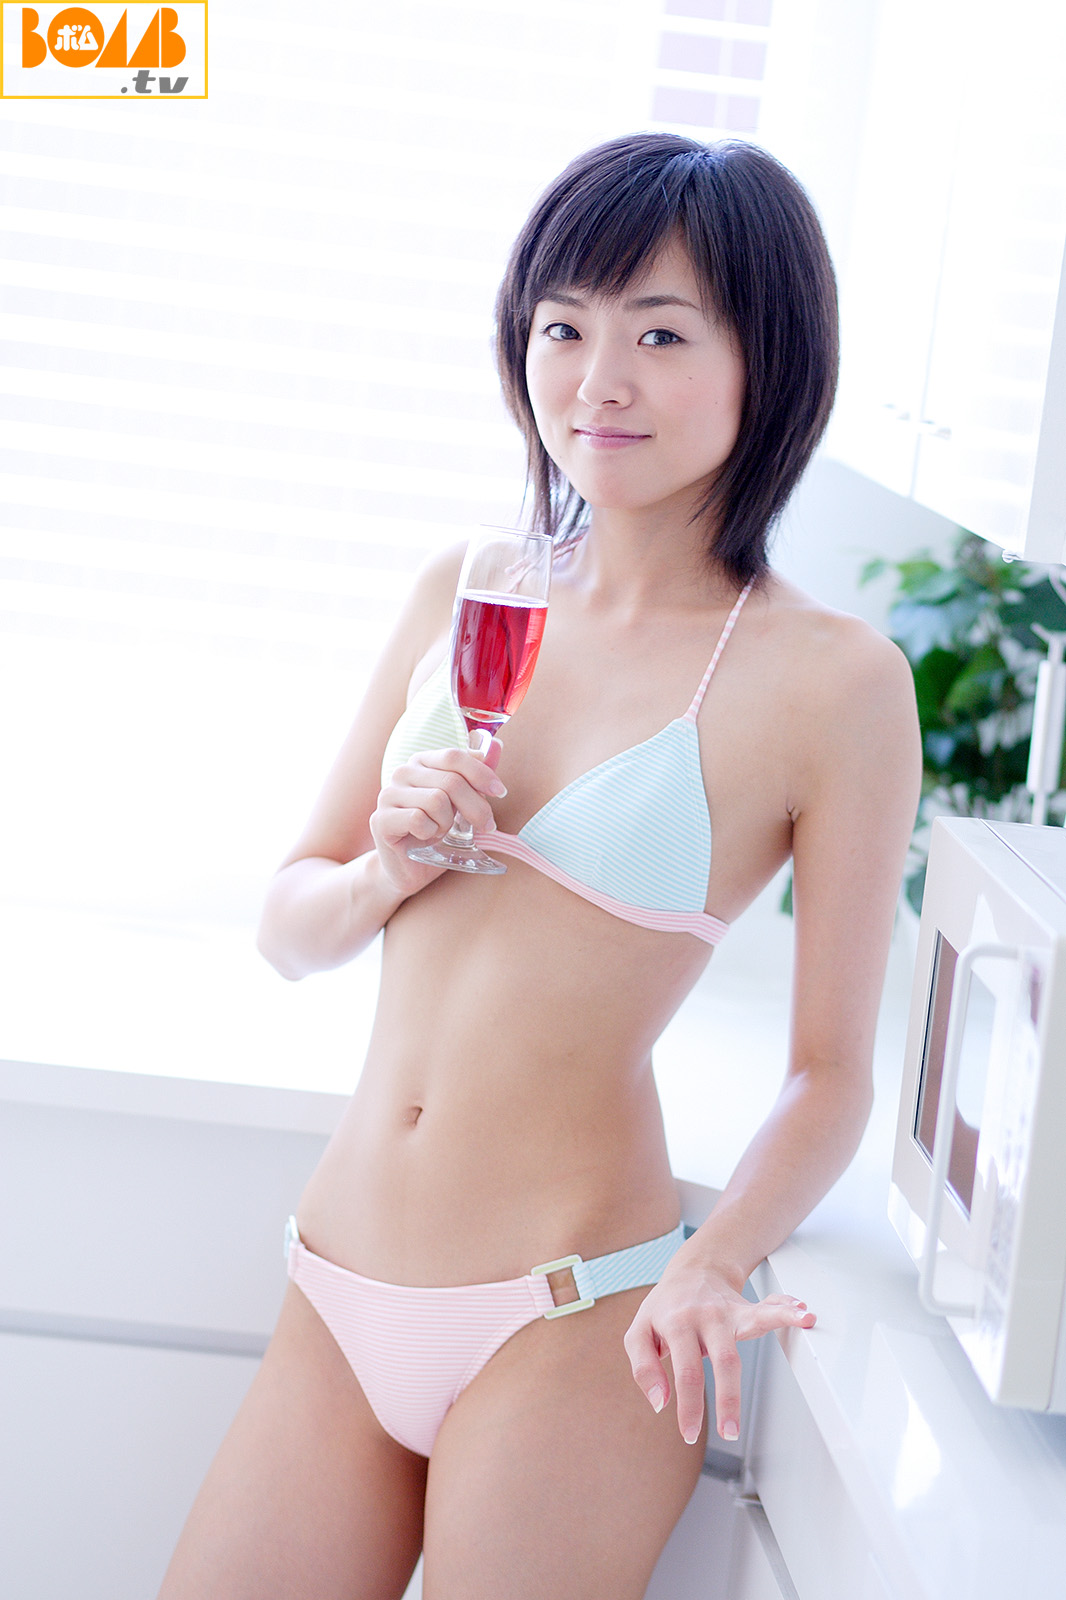 [bomb.tv] 2005-11 Channel B - Asagi Kudo 工藤あさぎ